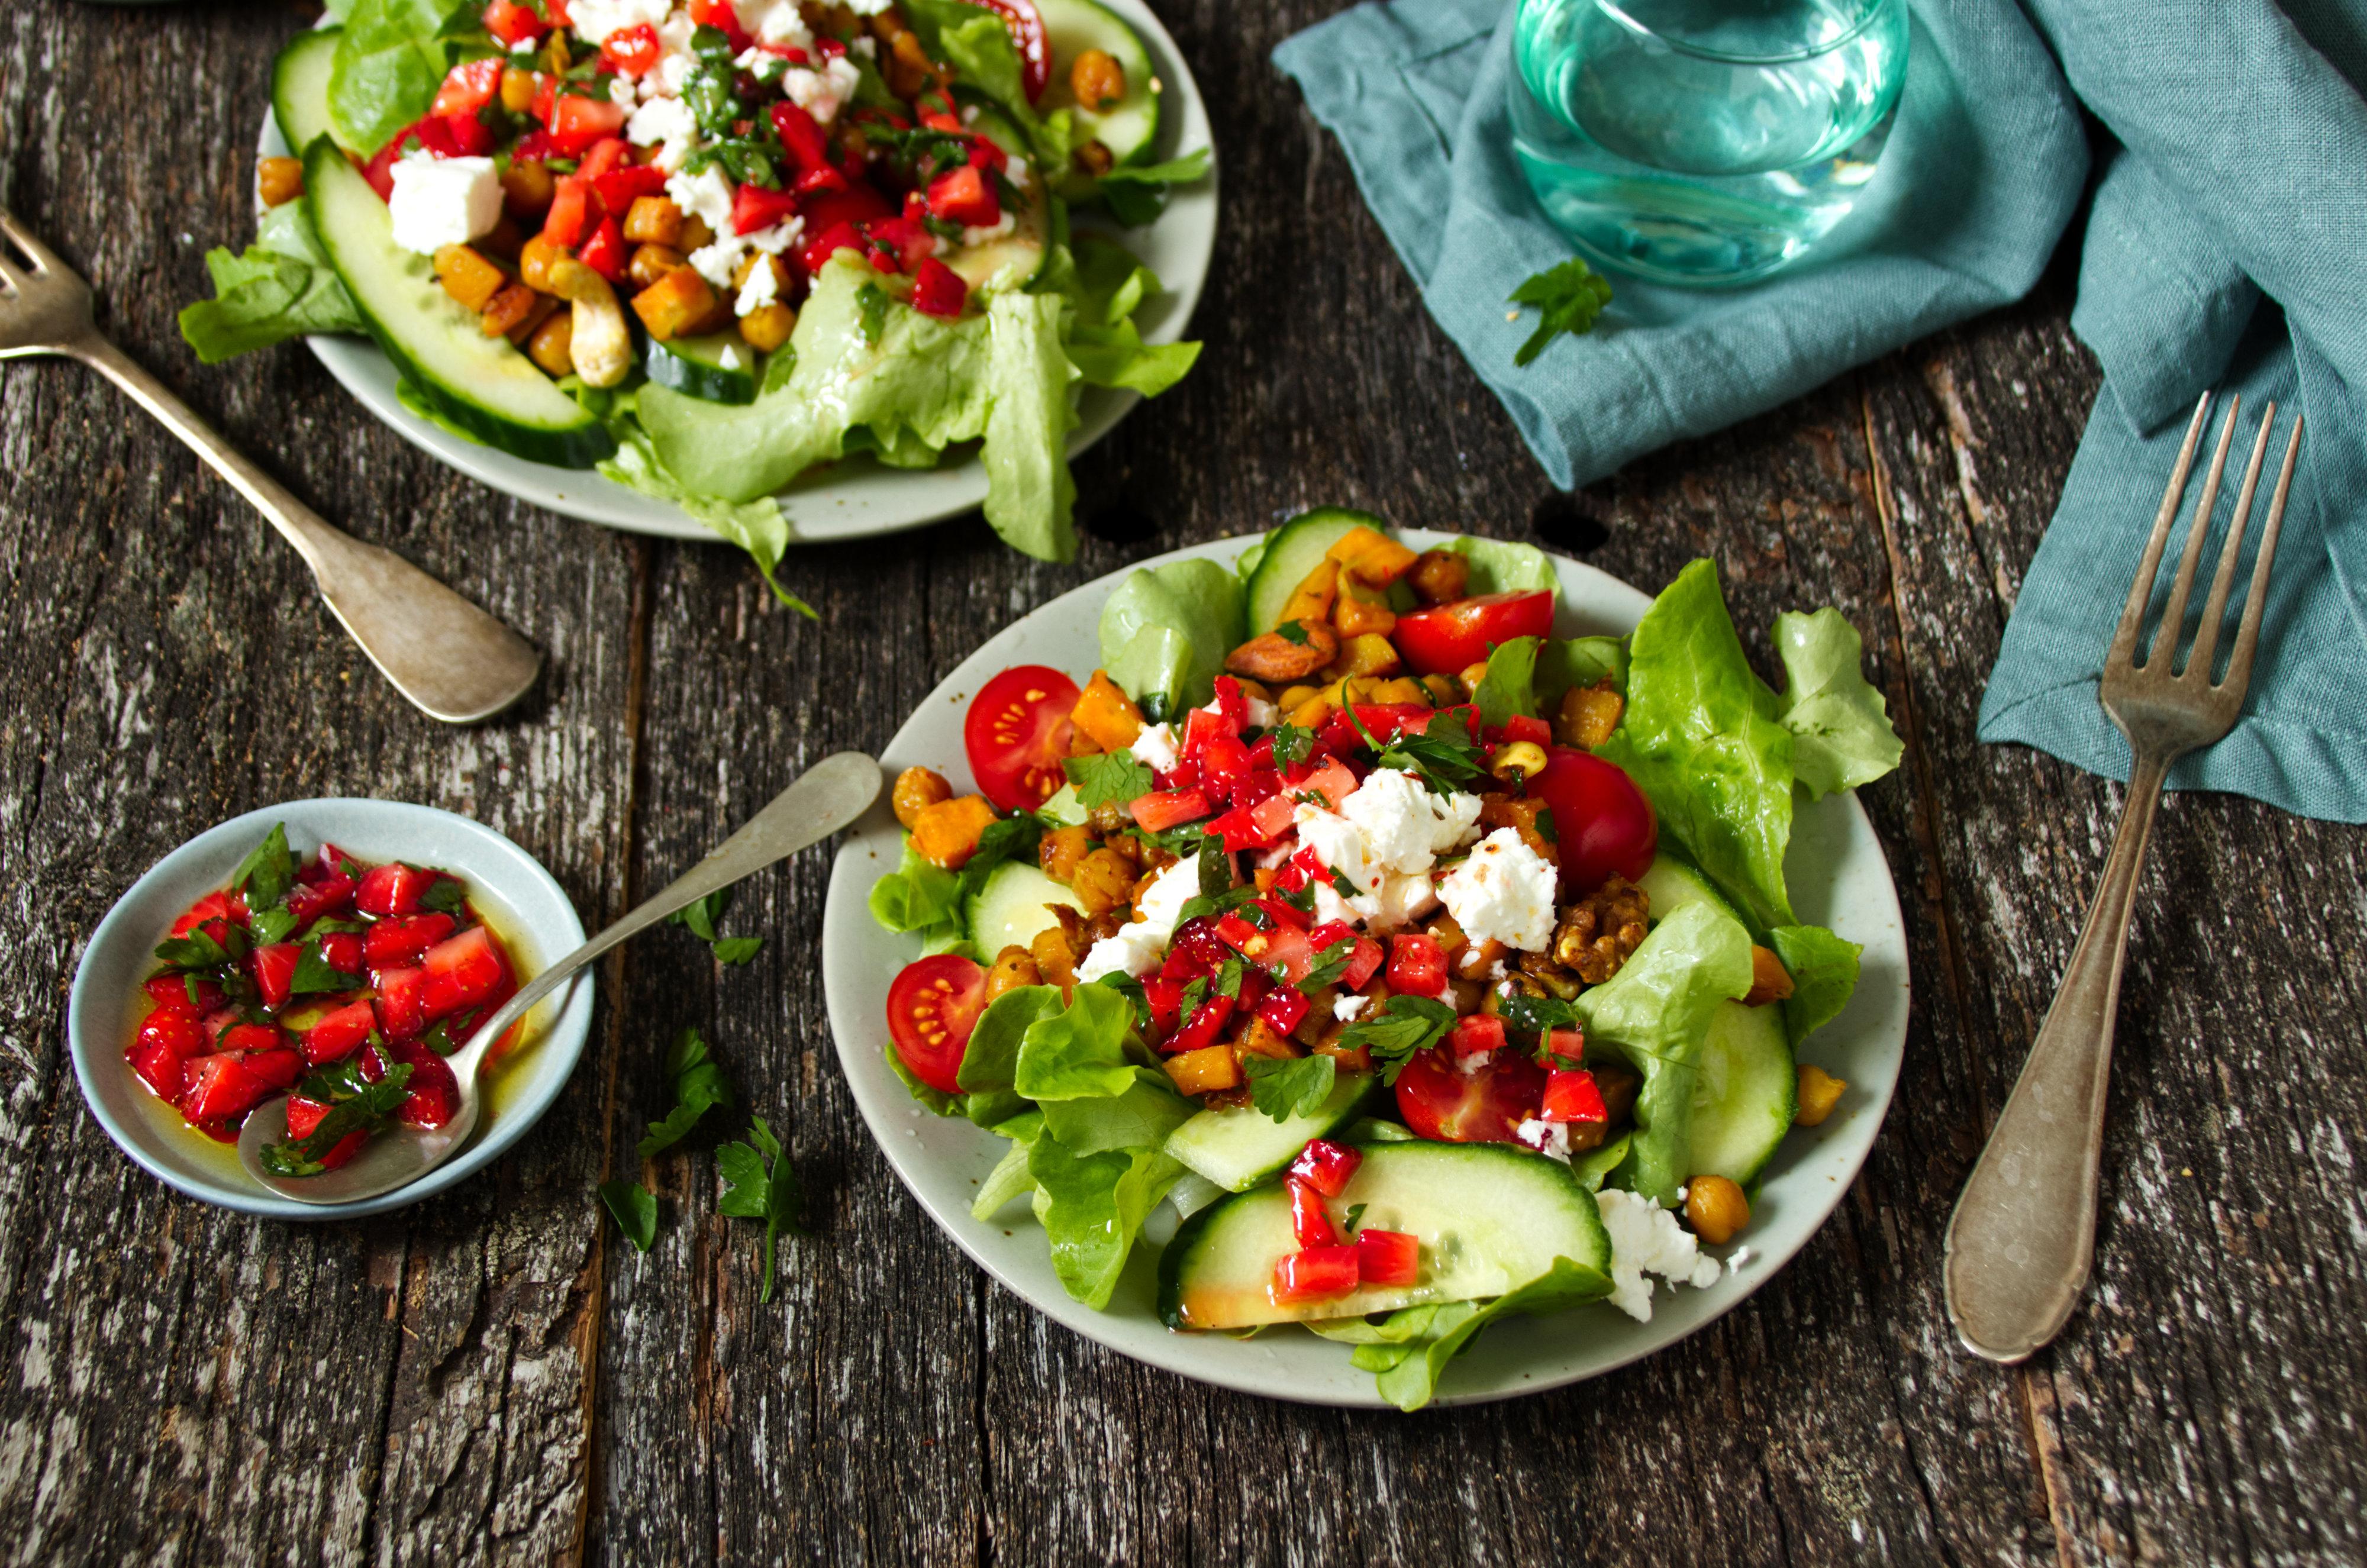 Bunter Salat mit Kichererbsen